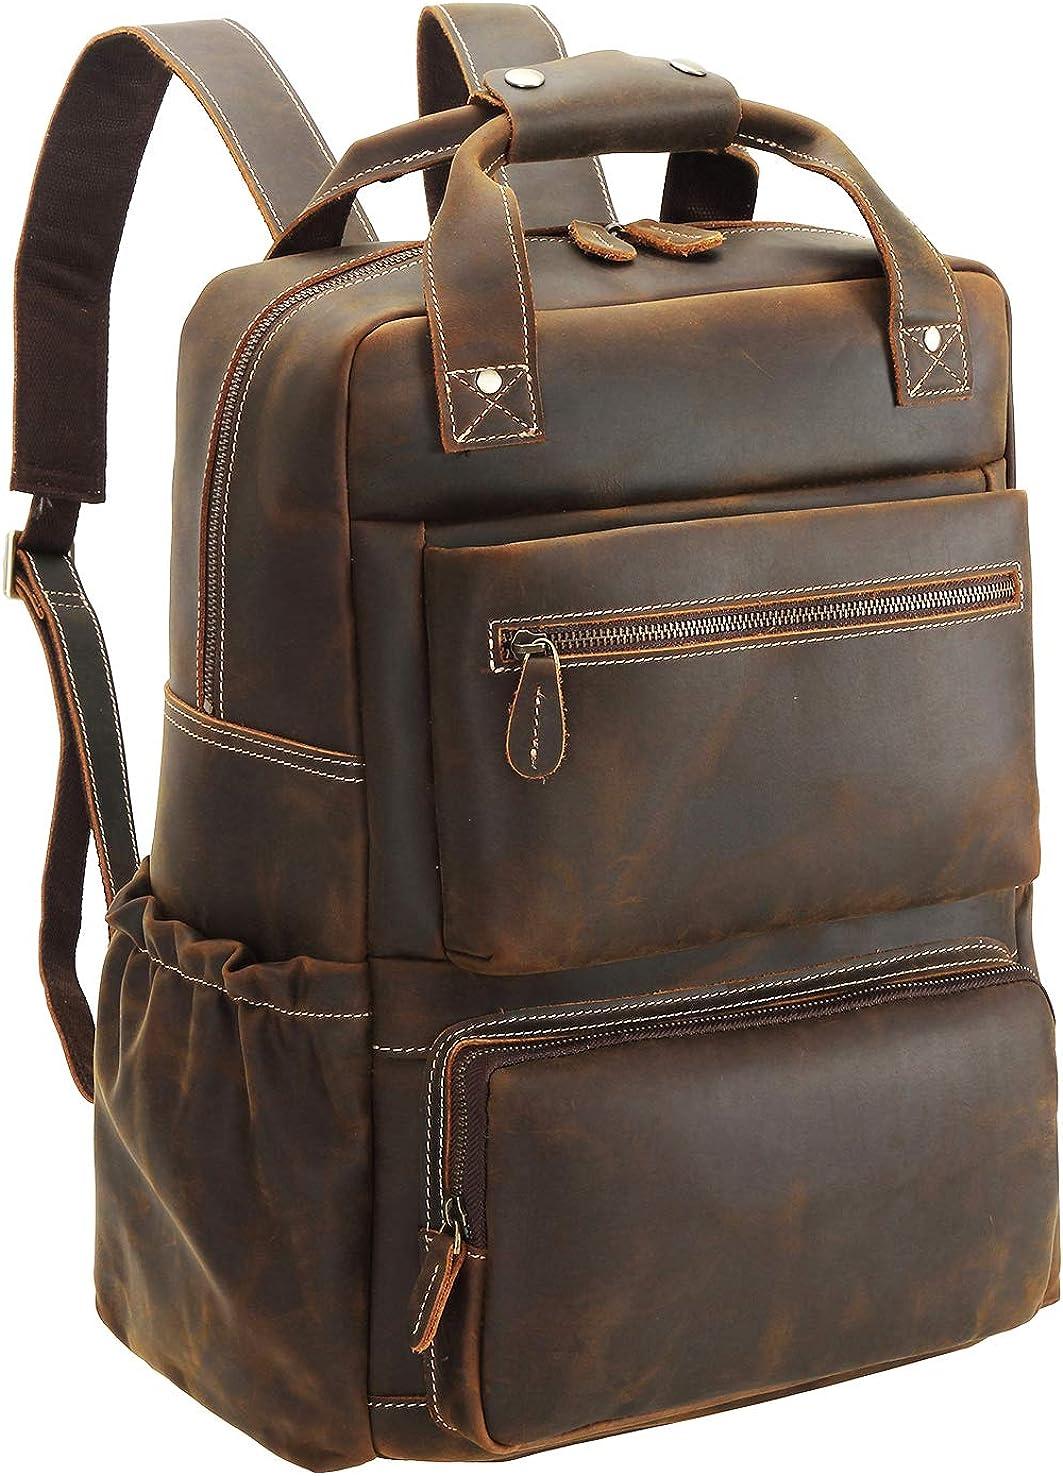 "Polare Men's Full Grain Italian Leather Backpack 15.6"" Laptop Bag Daypack Large Capacity for School Outdoors Travel"